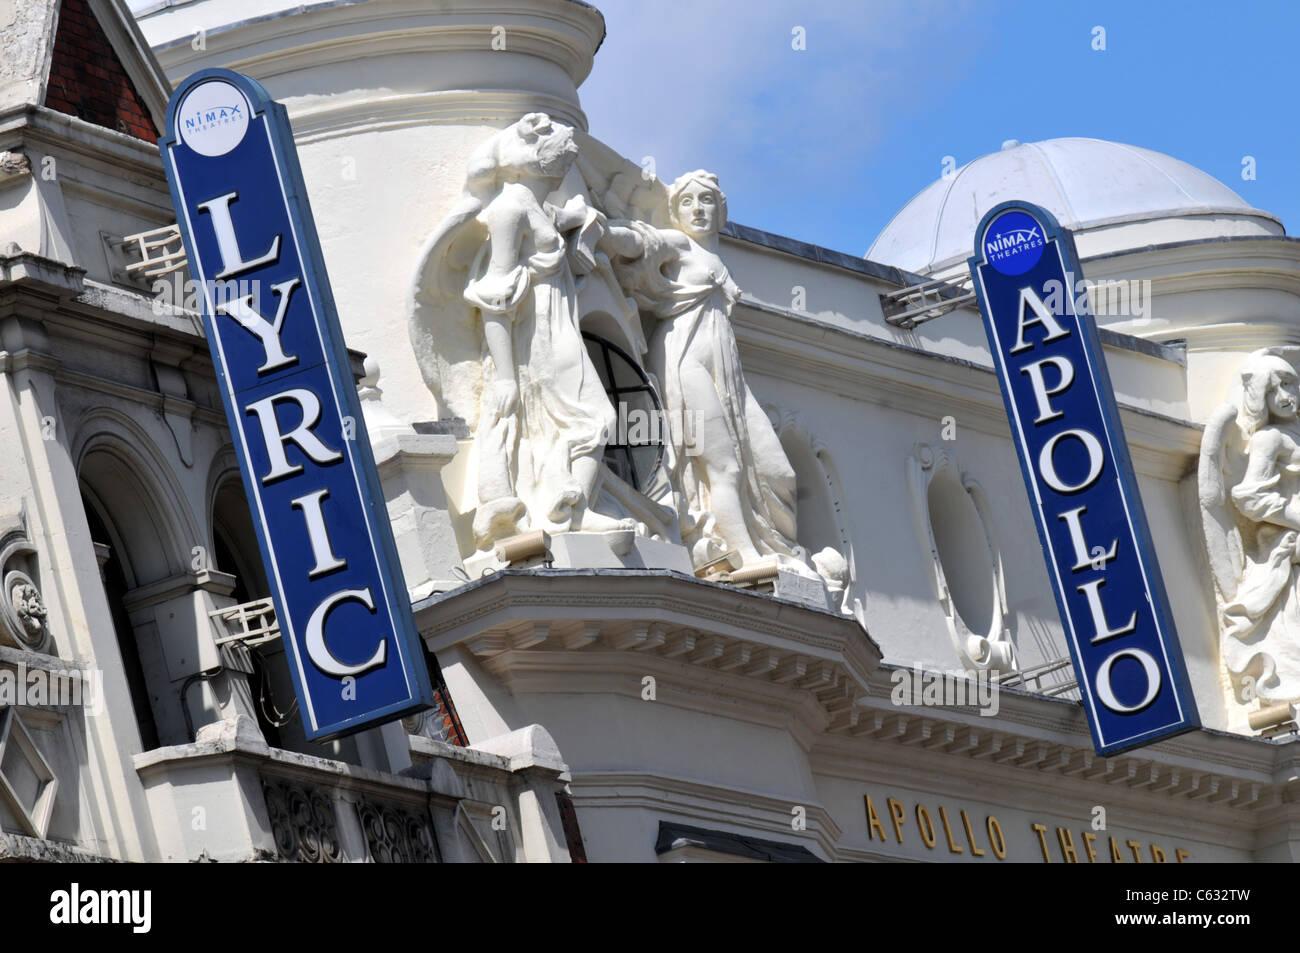 Lyric and Apollo Theatres, London, Britain, UK - Stock Image